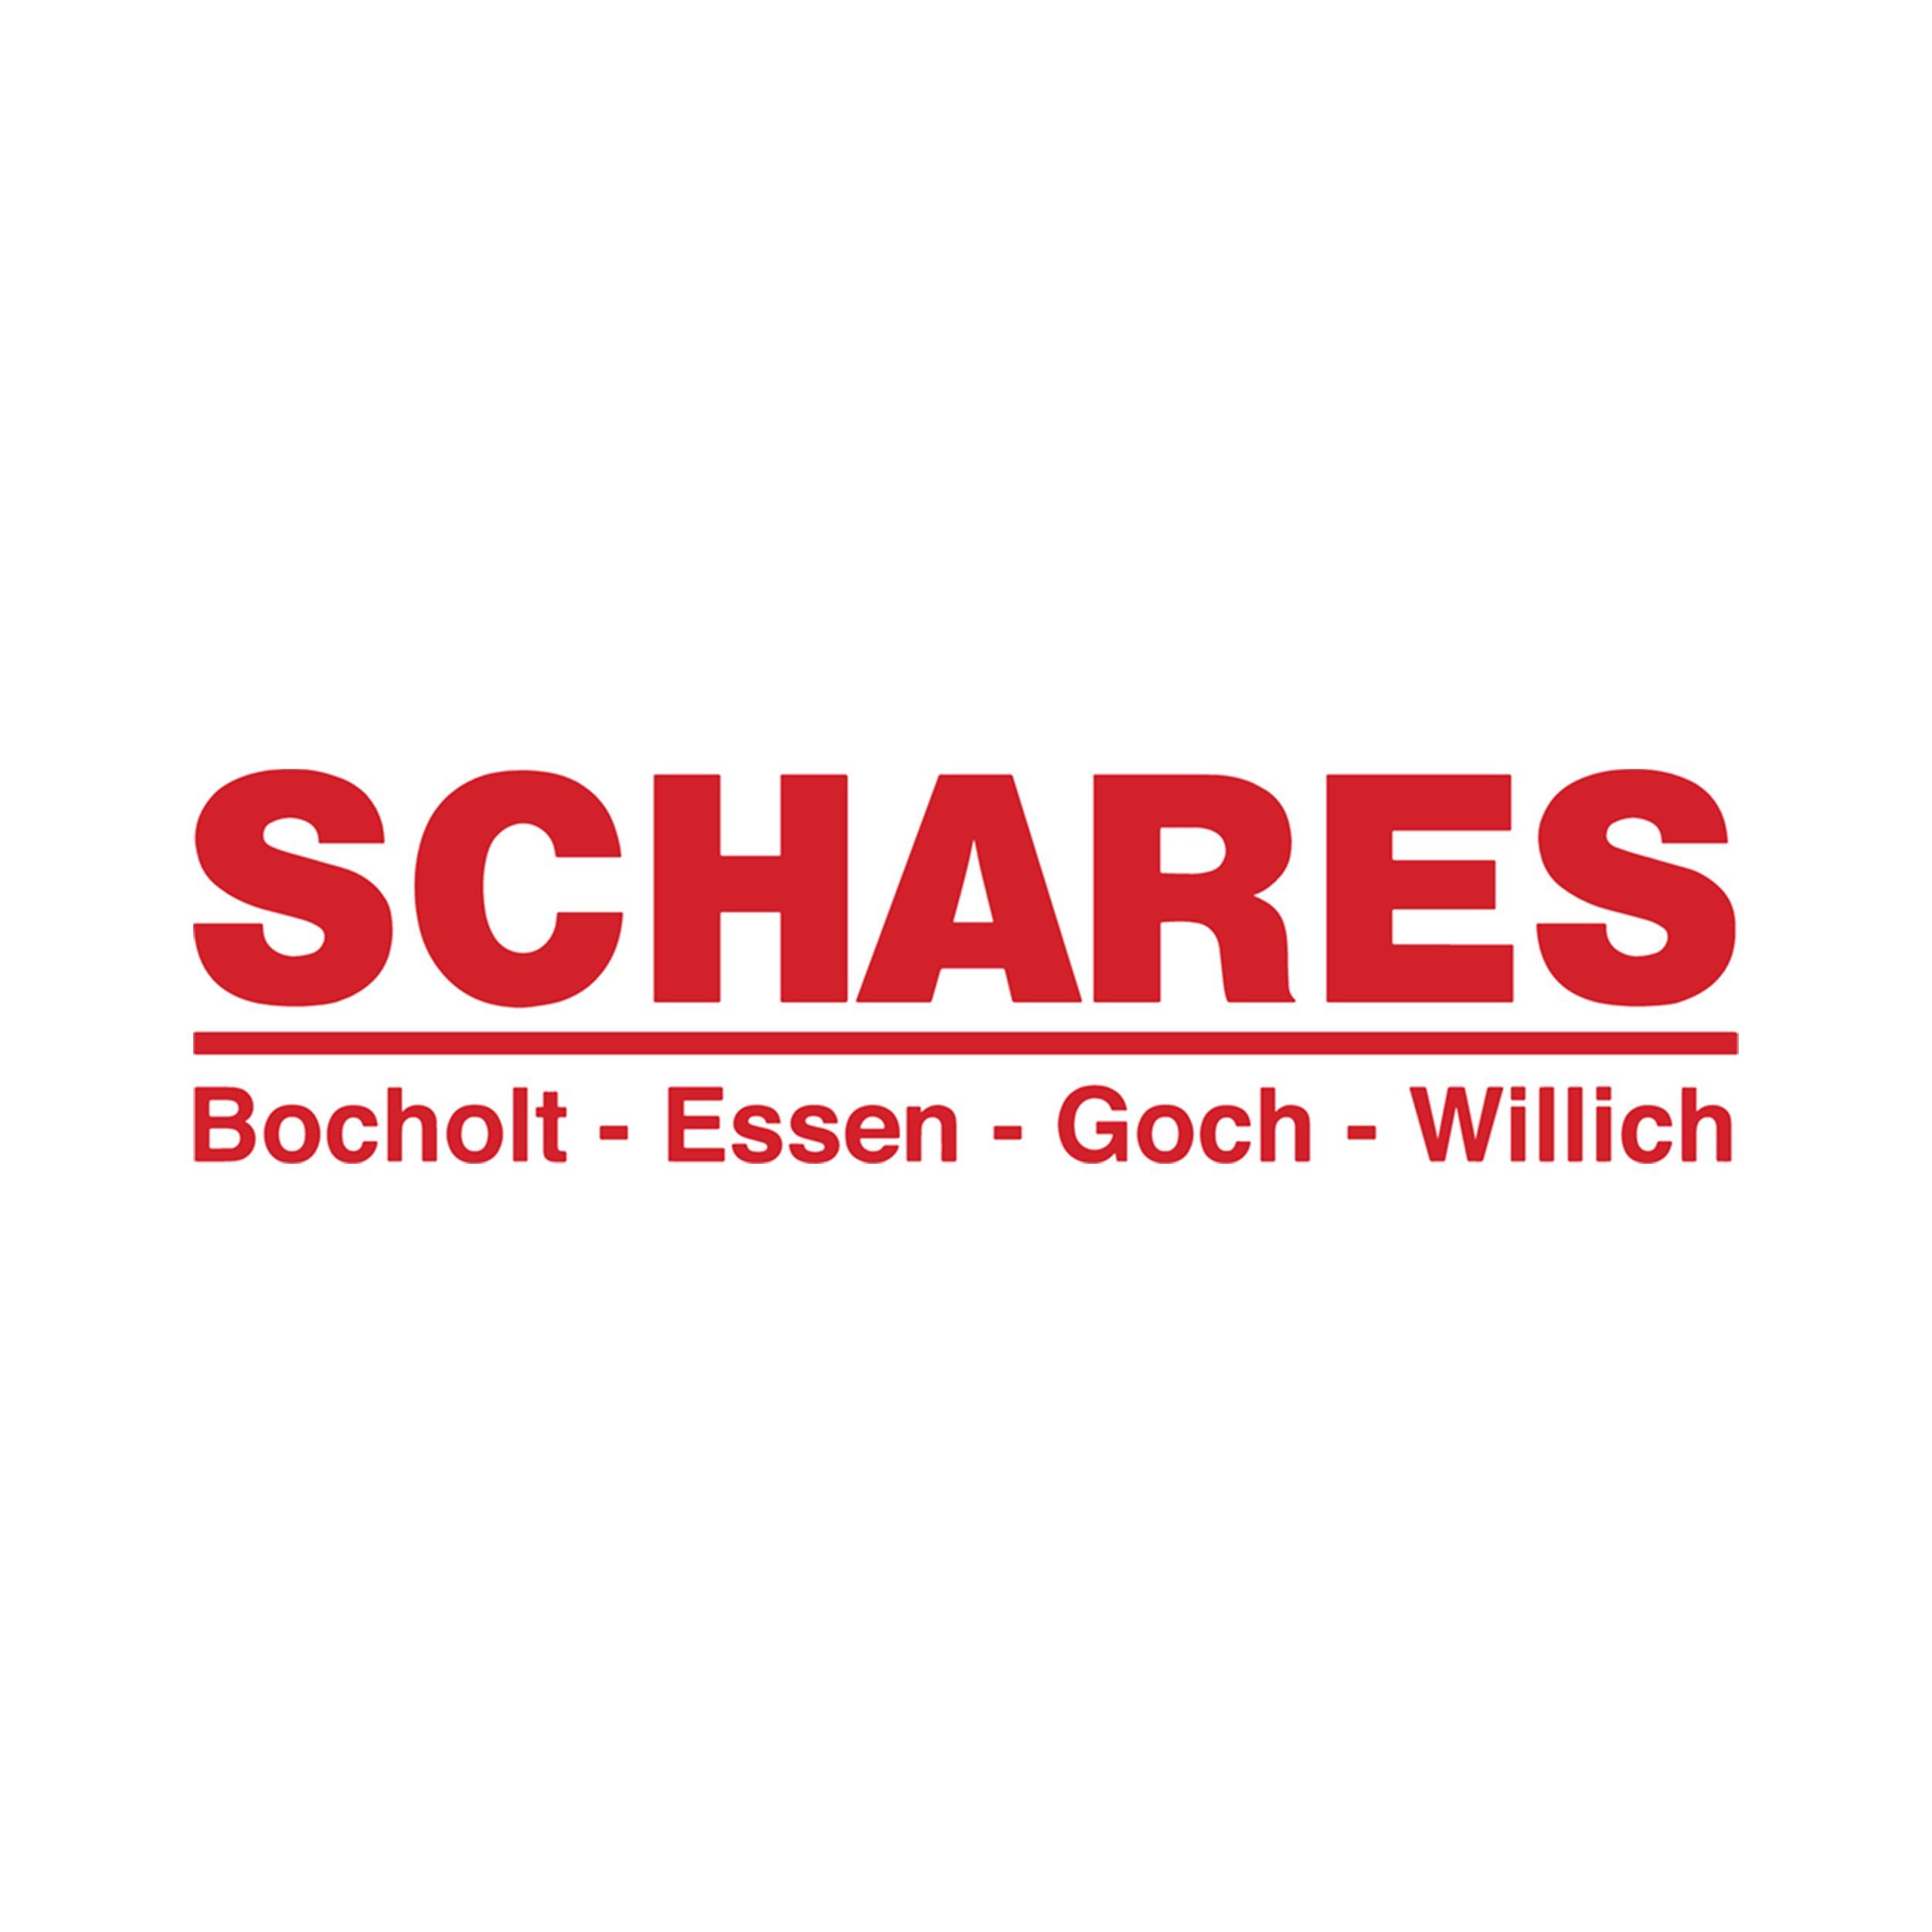 Bocholt800_Silber-Schares_20210811